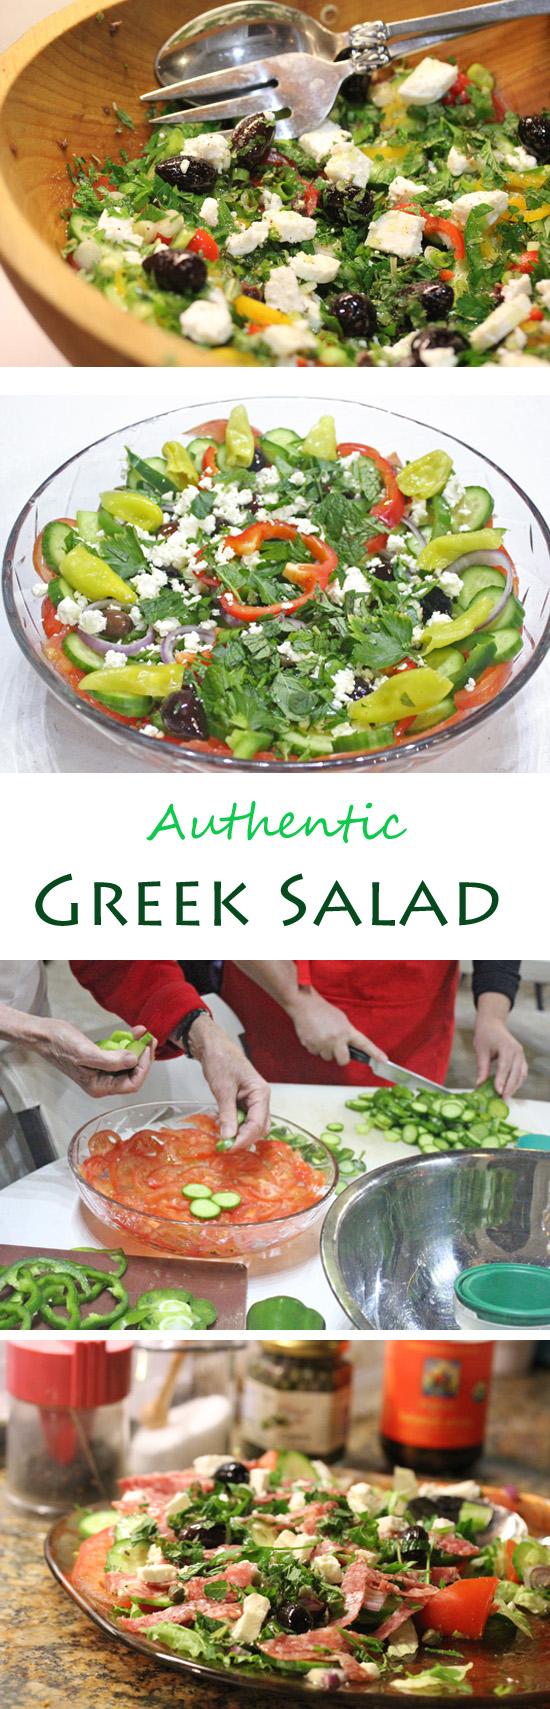 Greek Salad - Pinterest 2-16